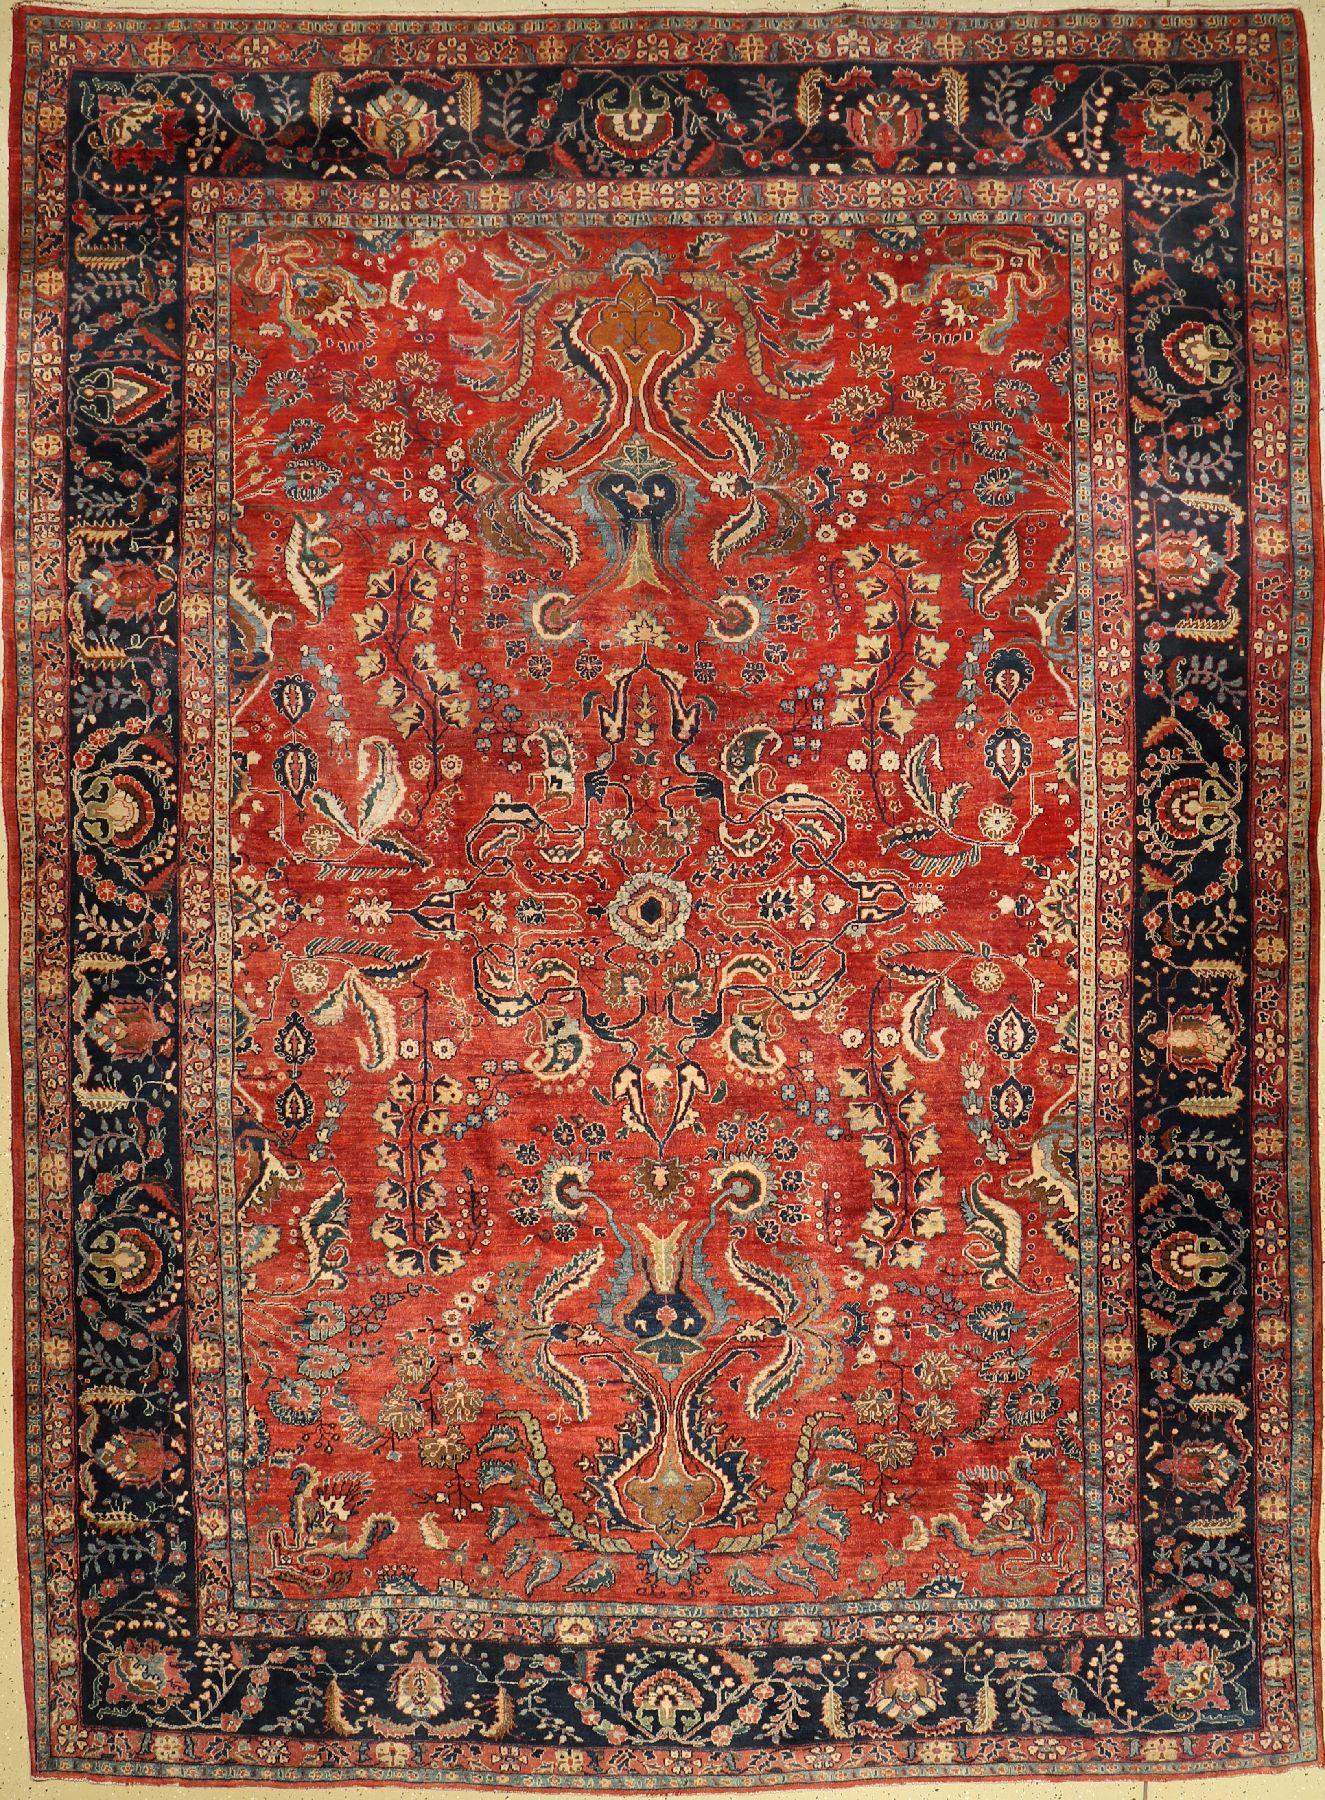 Saruk Mohajeran antique, (US re-import), Persia, around 1890, wool, approx. 357 x 264 cm, condition: